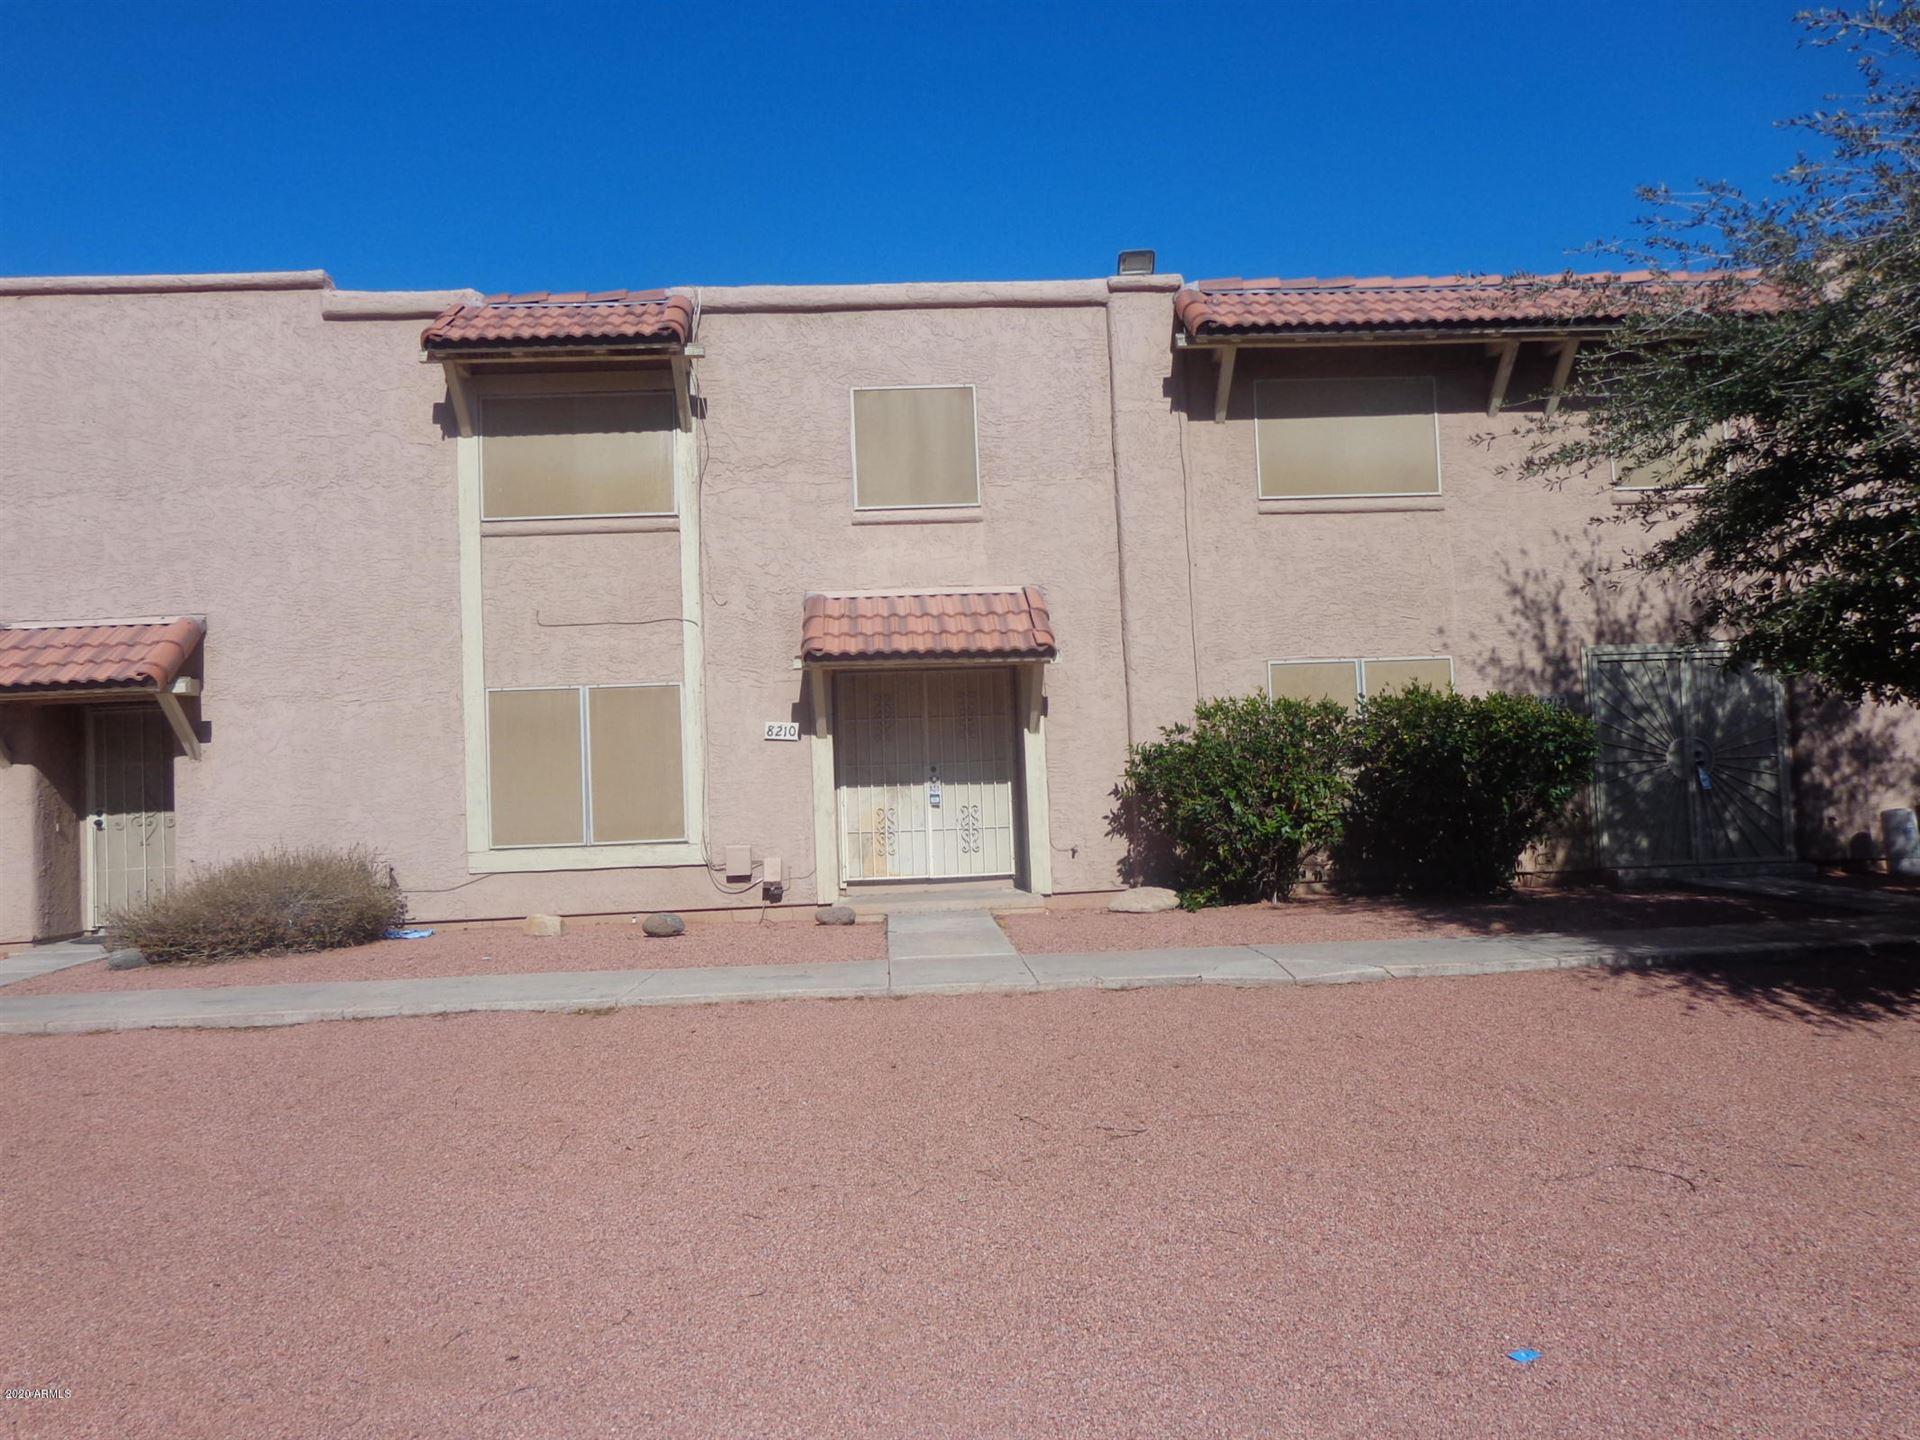 8210 N 32ND Avenue, Phoenix, AZ 85051 - MLS#: 6159853